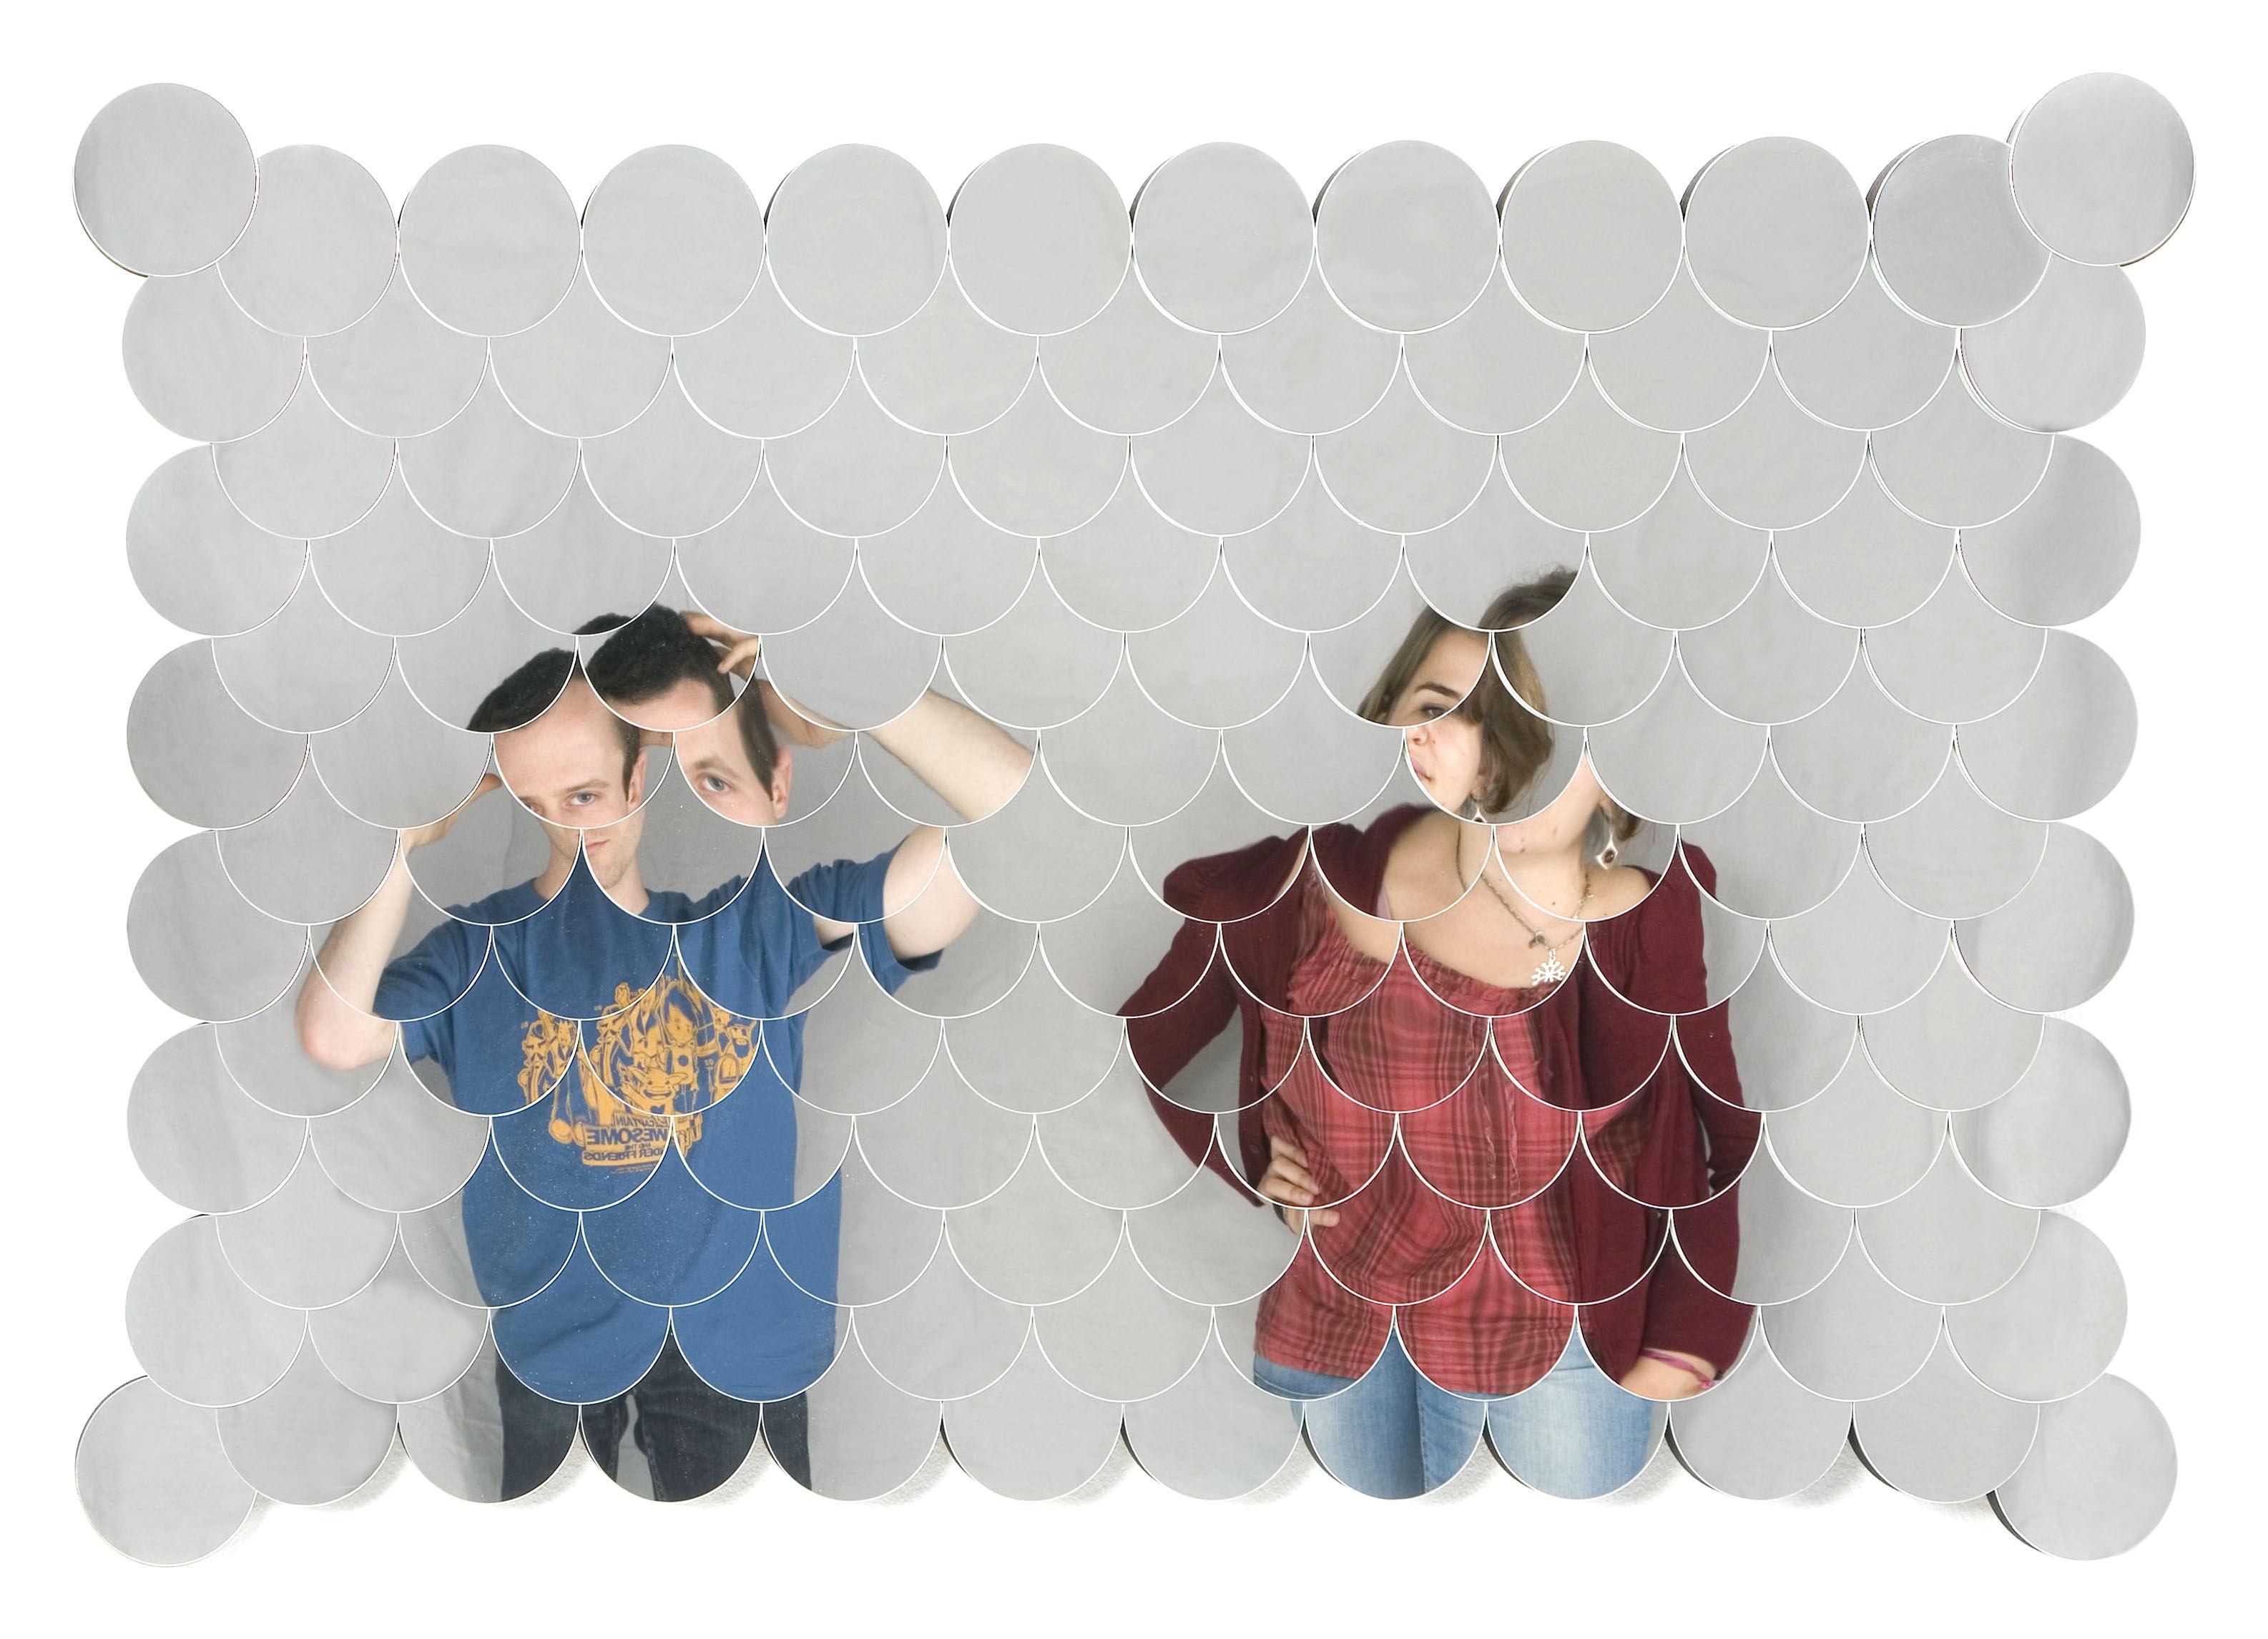 Furniture - Mirrors - Sirène Wall mirror - Small - L 104 x H 69 cm by Tsé-Tsé - Mirror Small - 104 x 69 cm - Glass